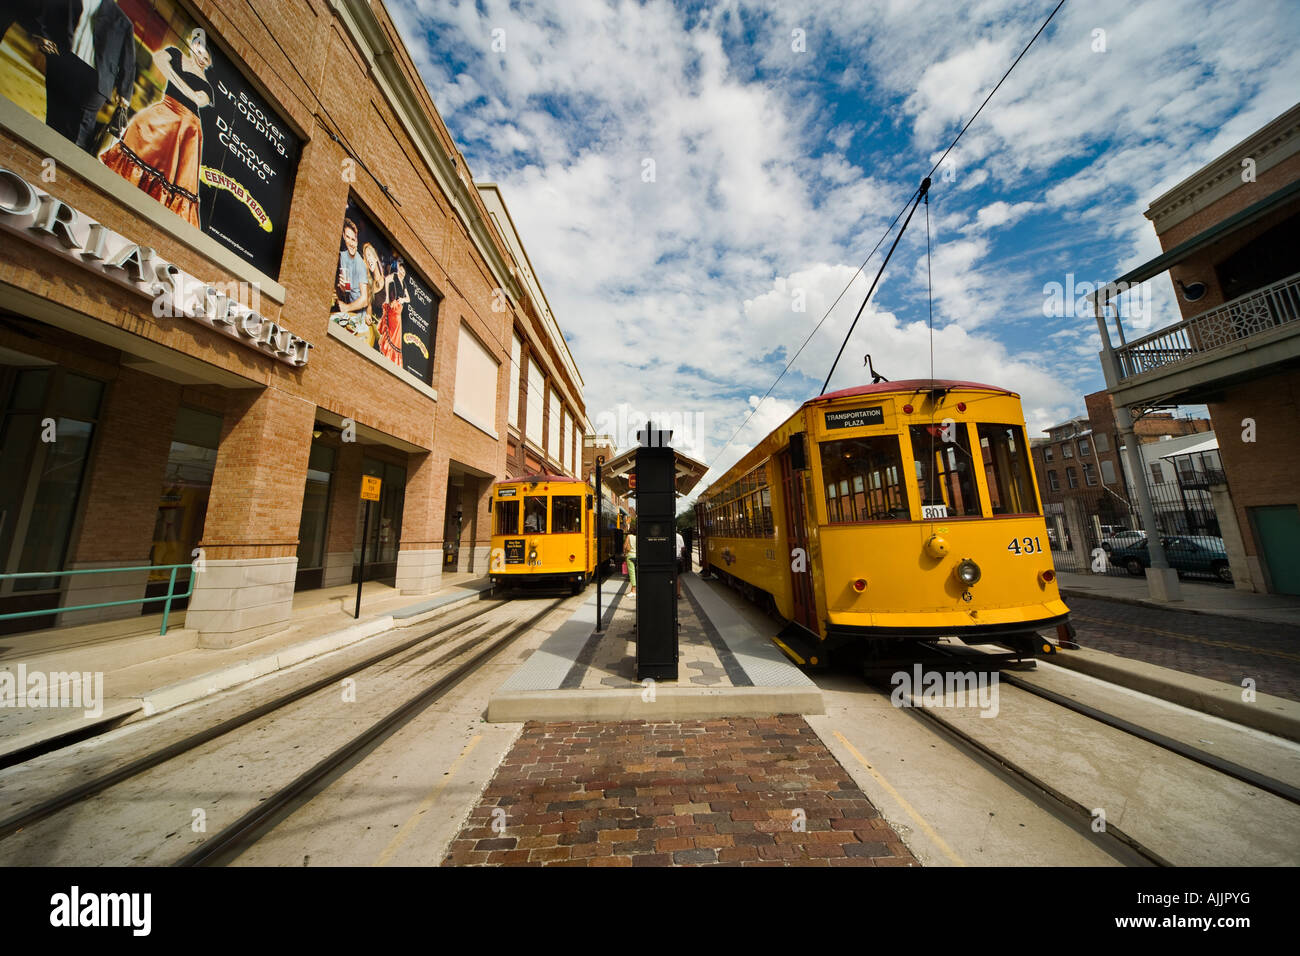 Tampa Florida US historic Spanish Cuban district Ybor City TECO Line electric trolley streetcar at Centro Ybor stop - Stock Image